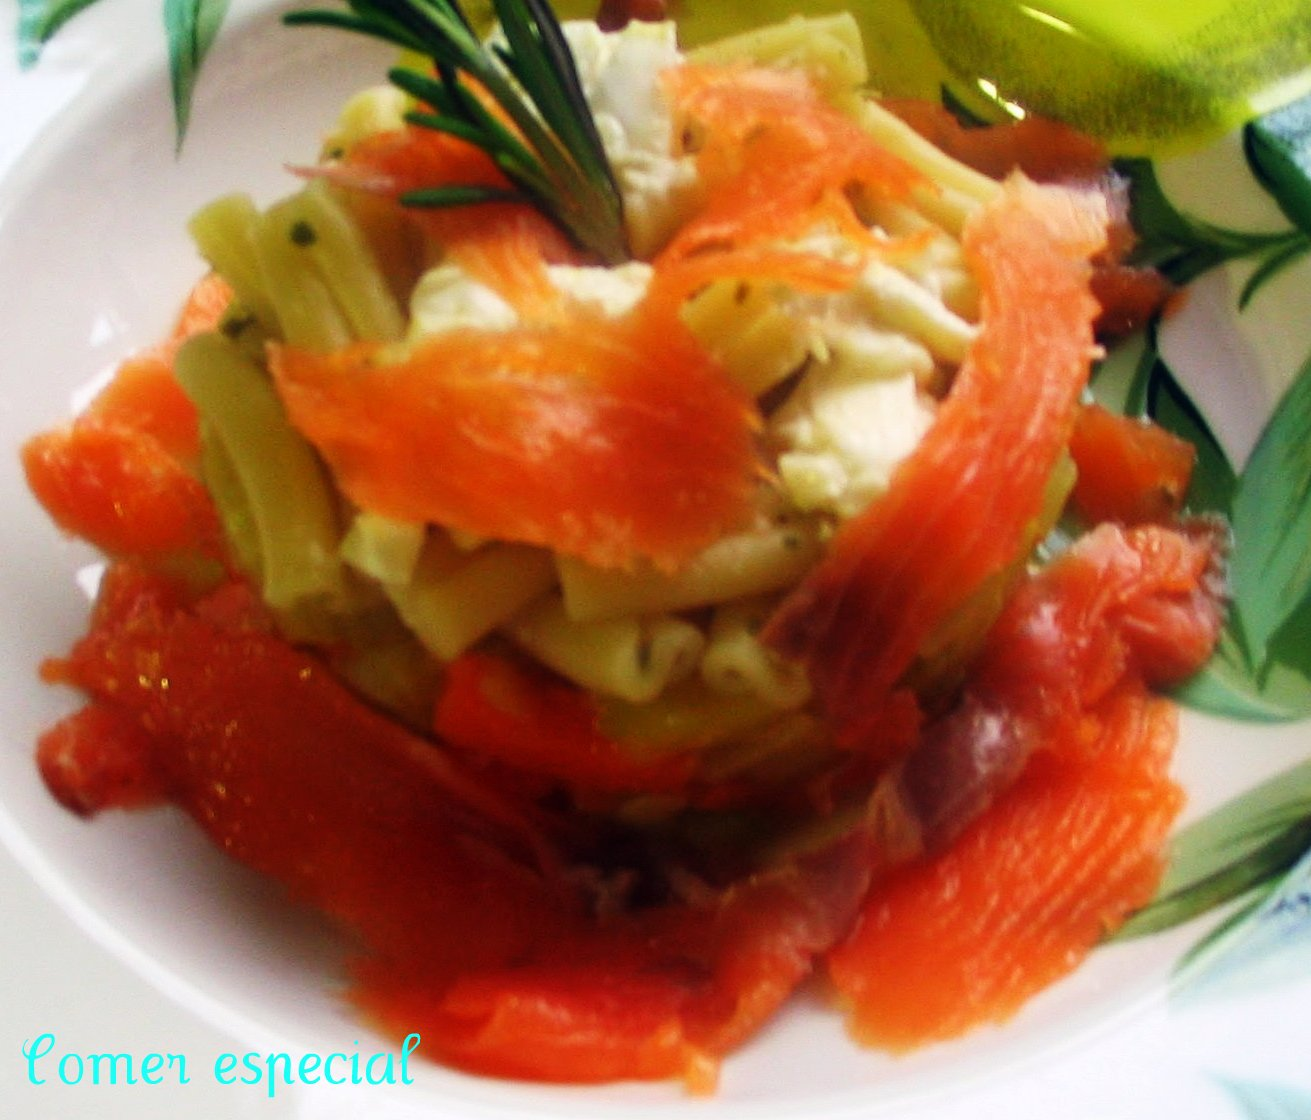 http://comerespecial.blogspot.com.es/2013/03/timbal-de-pasta-con-salmon-verduras-y.html